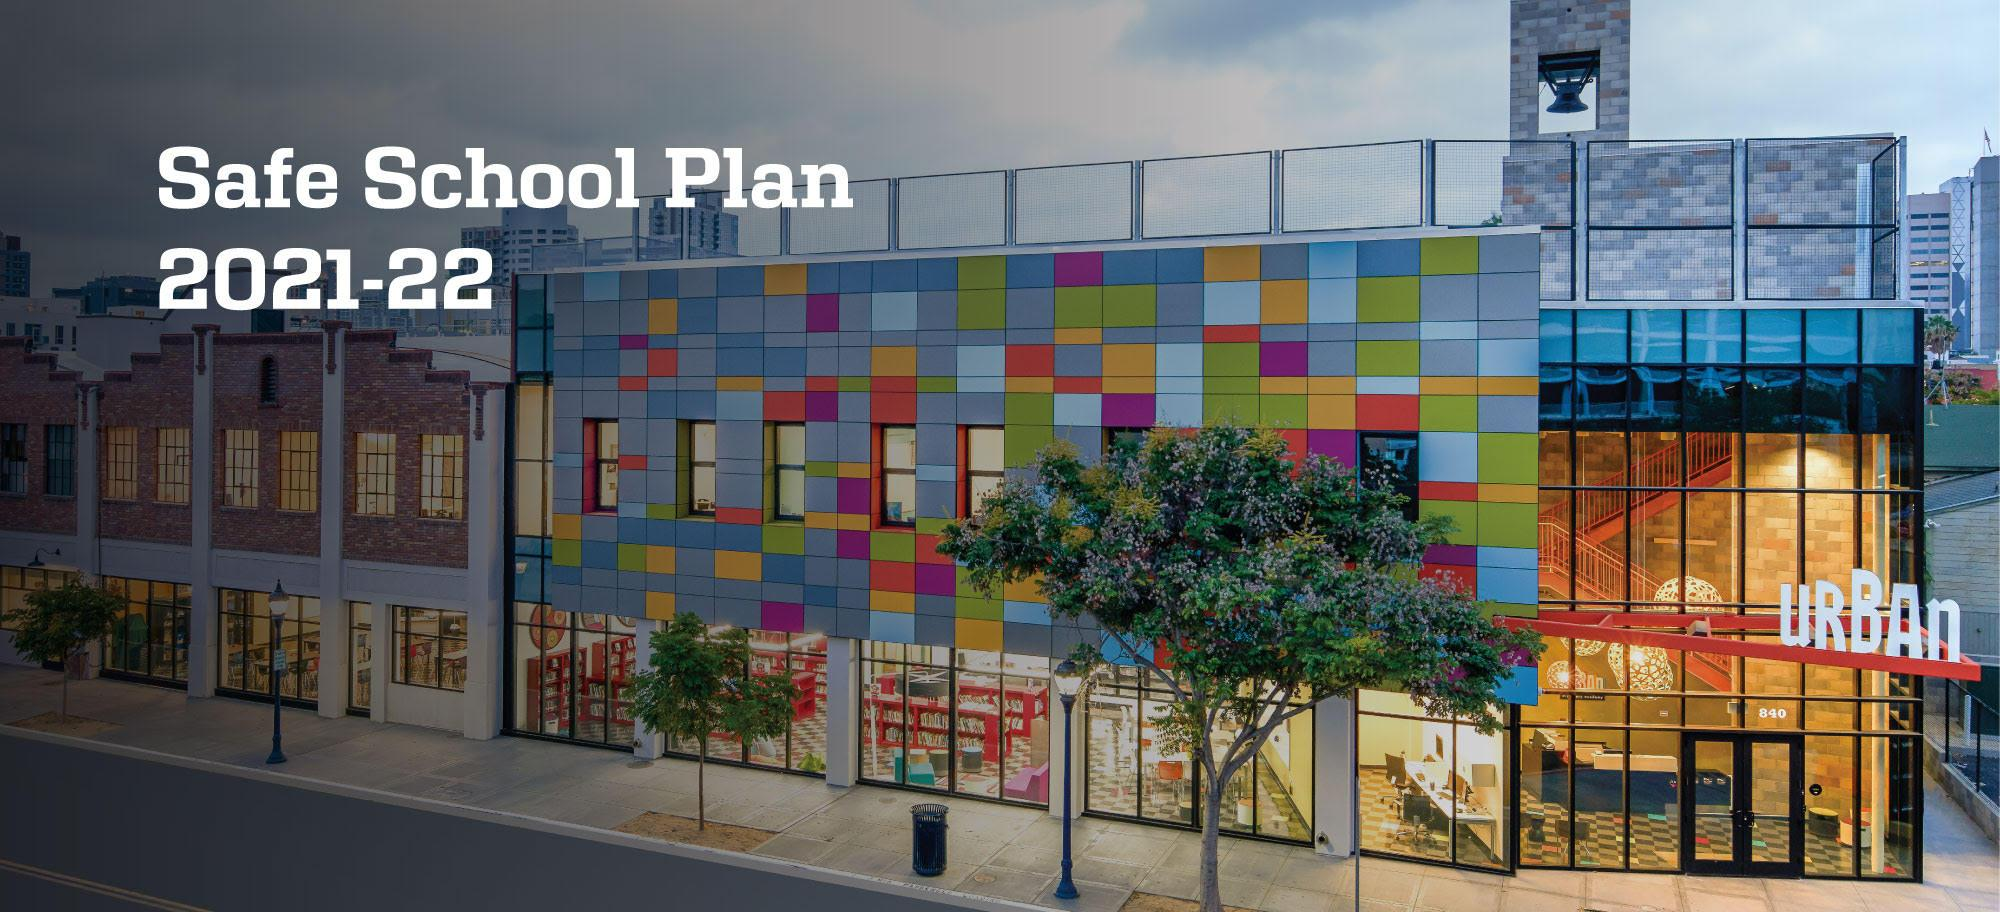 Urban Discovery 2021-22 Safe School Plan